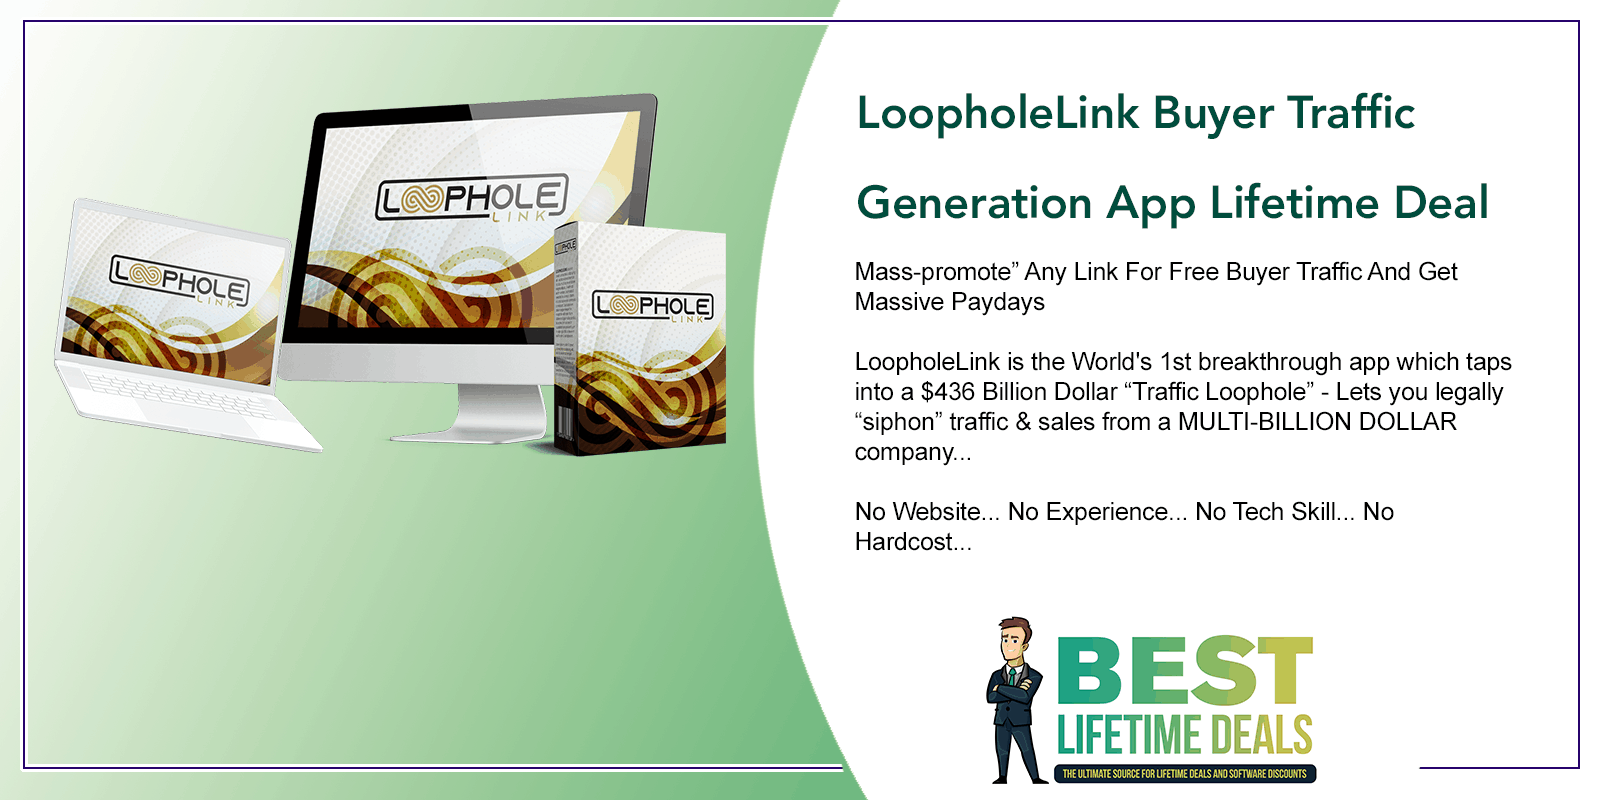 LoopholeLink Buyer Traffic Generation App Featured Image